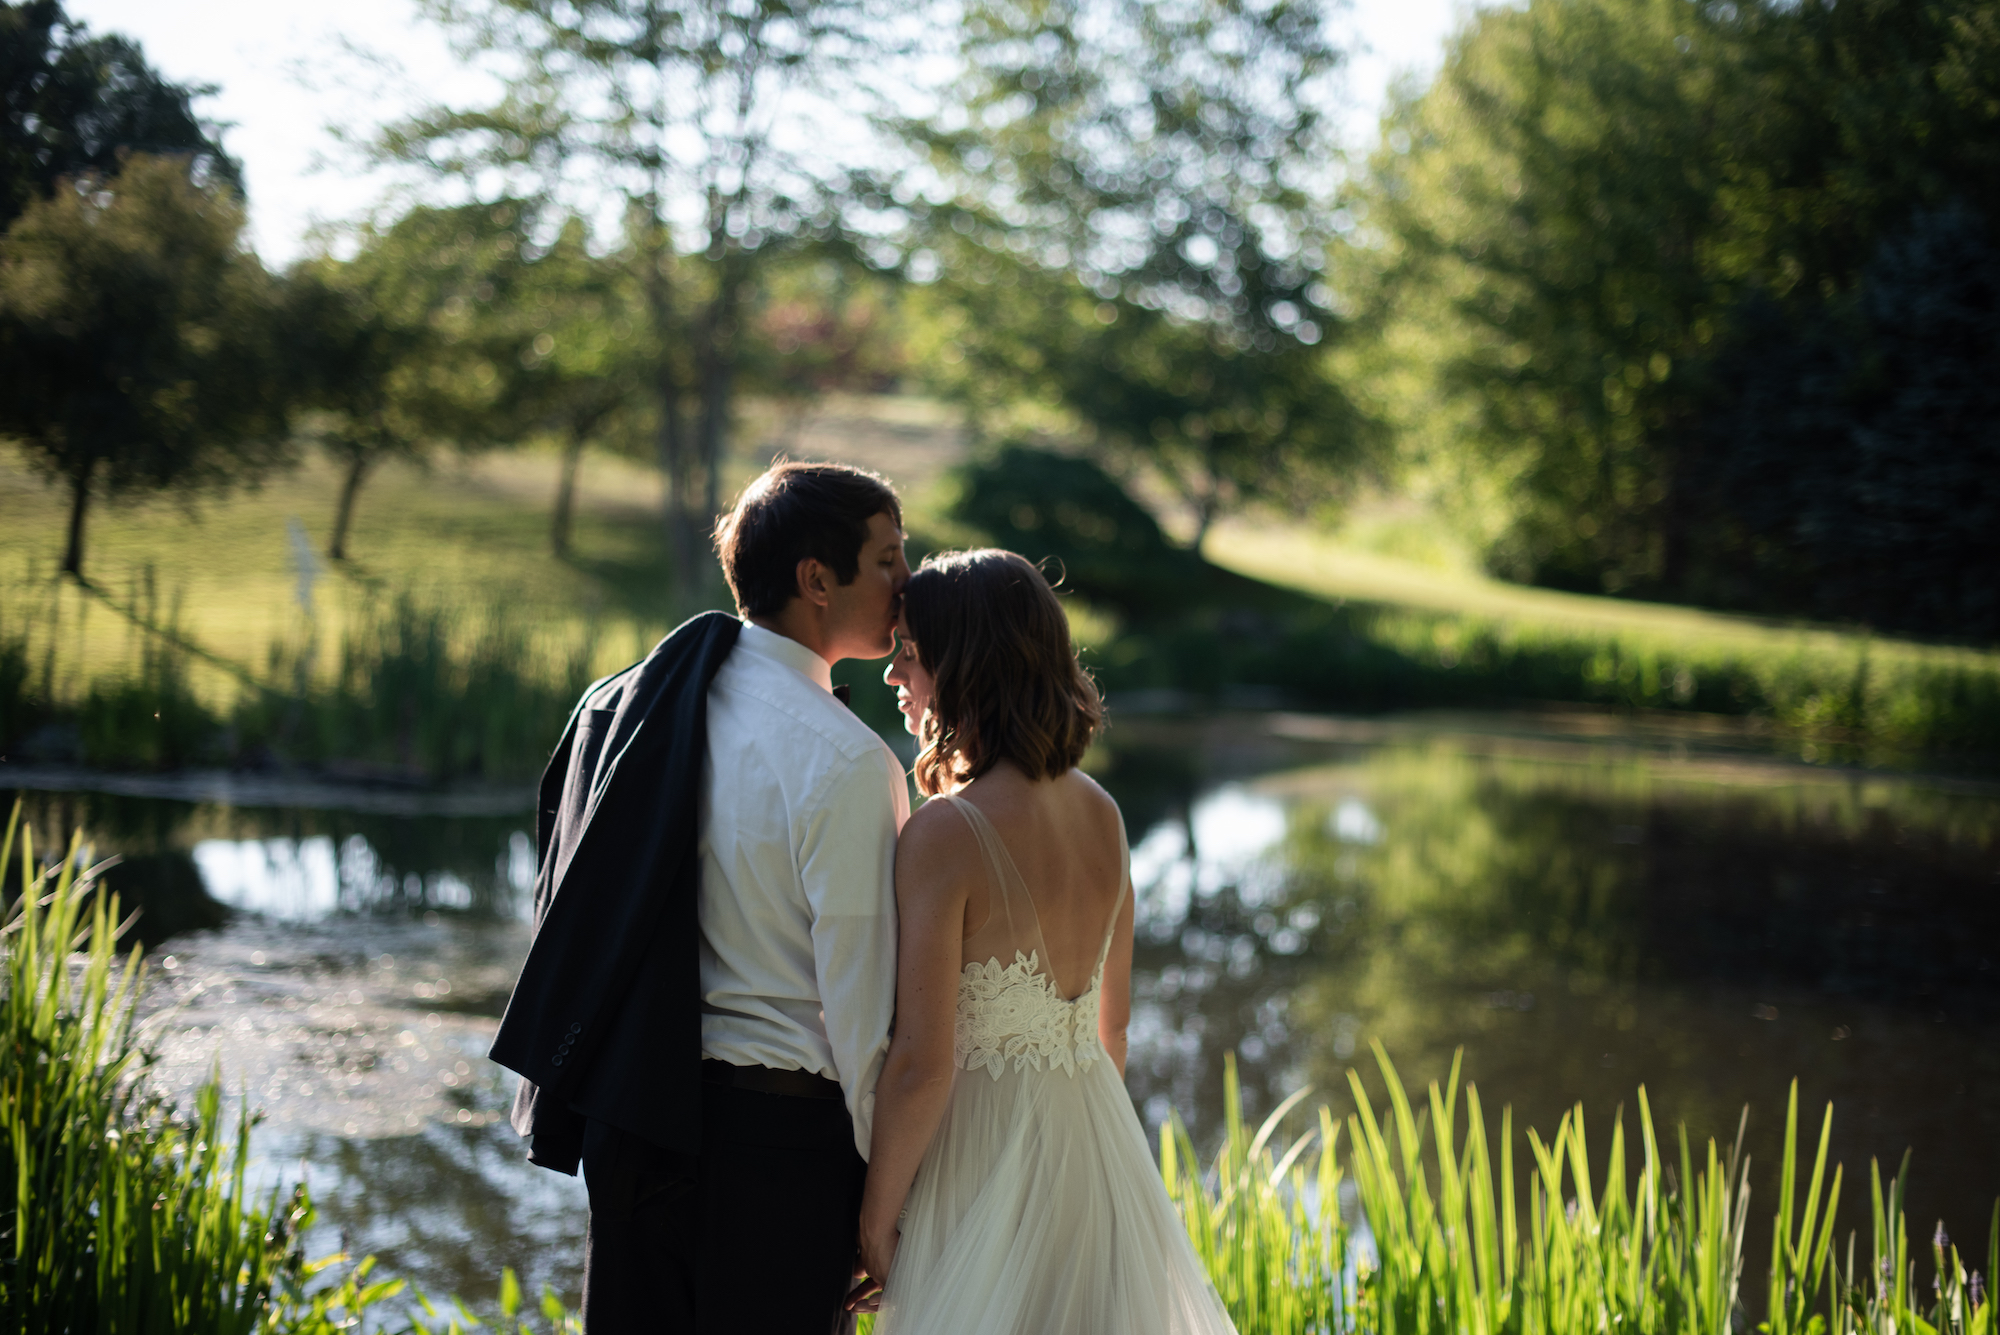 st-augustine-photographers-st-augustine-wedding-photographer-sarah-annay18.jpg